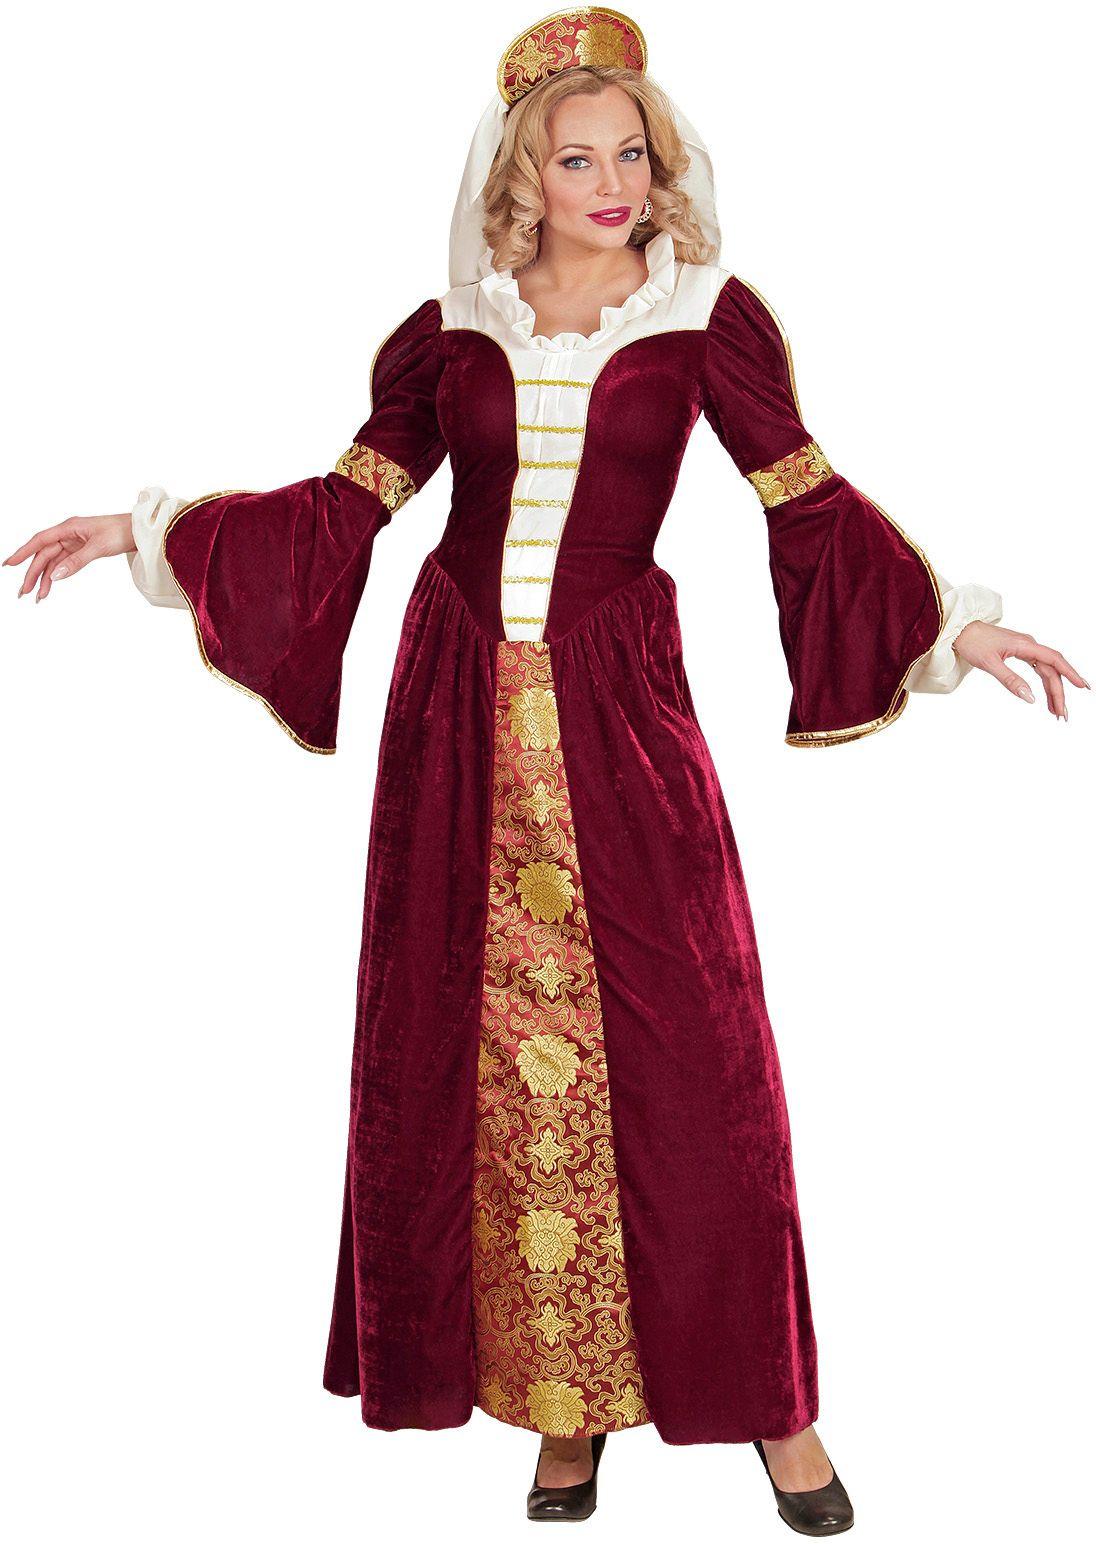 Middeleeuwse koningin jurk